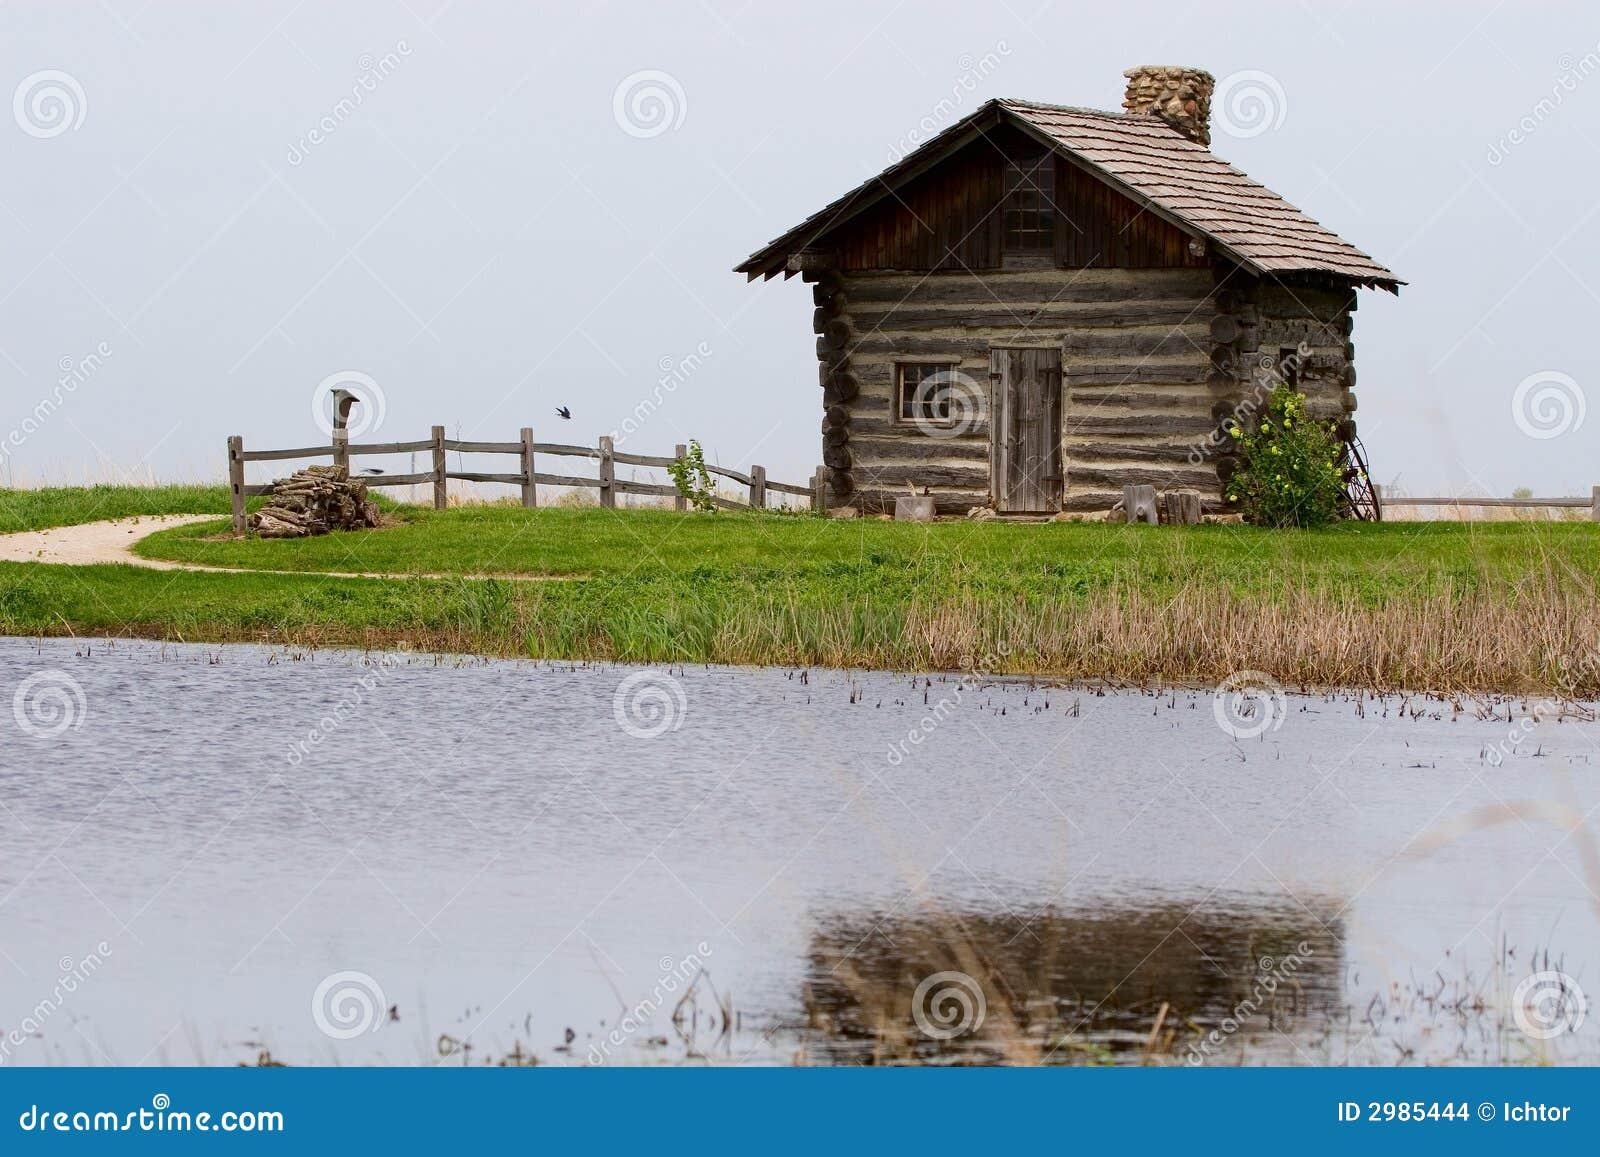 Log Cabin On Lake Stock Images Image 2985444